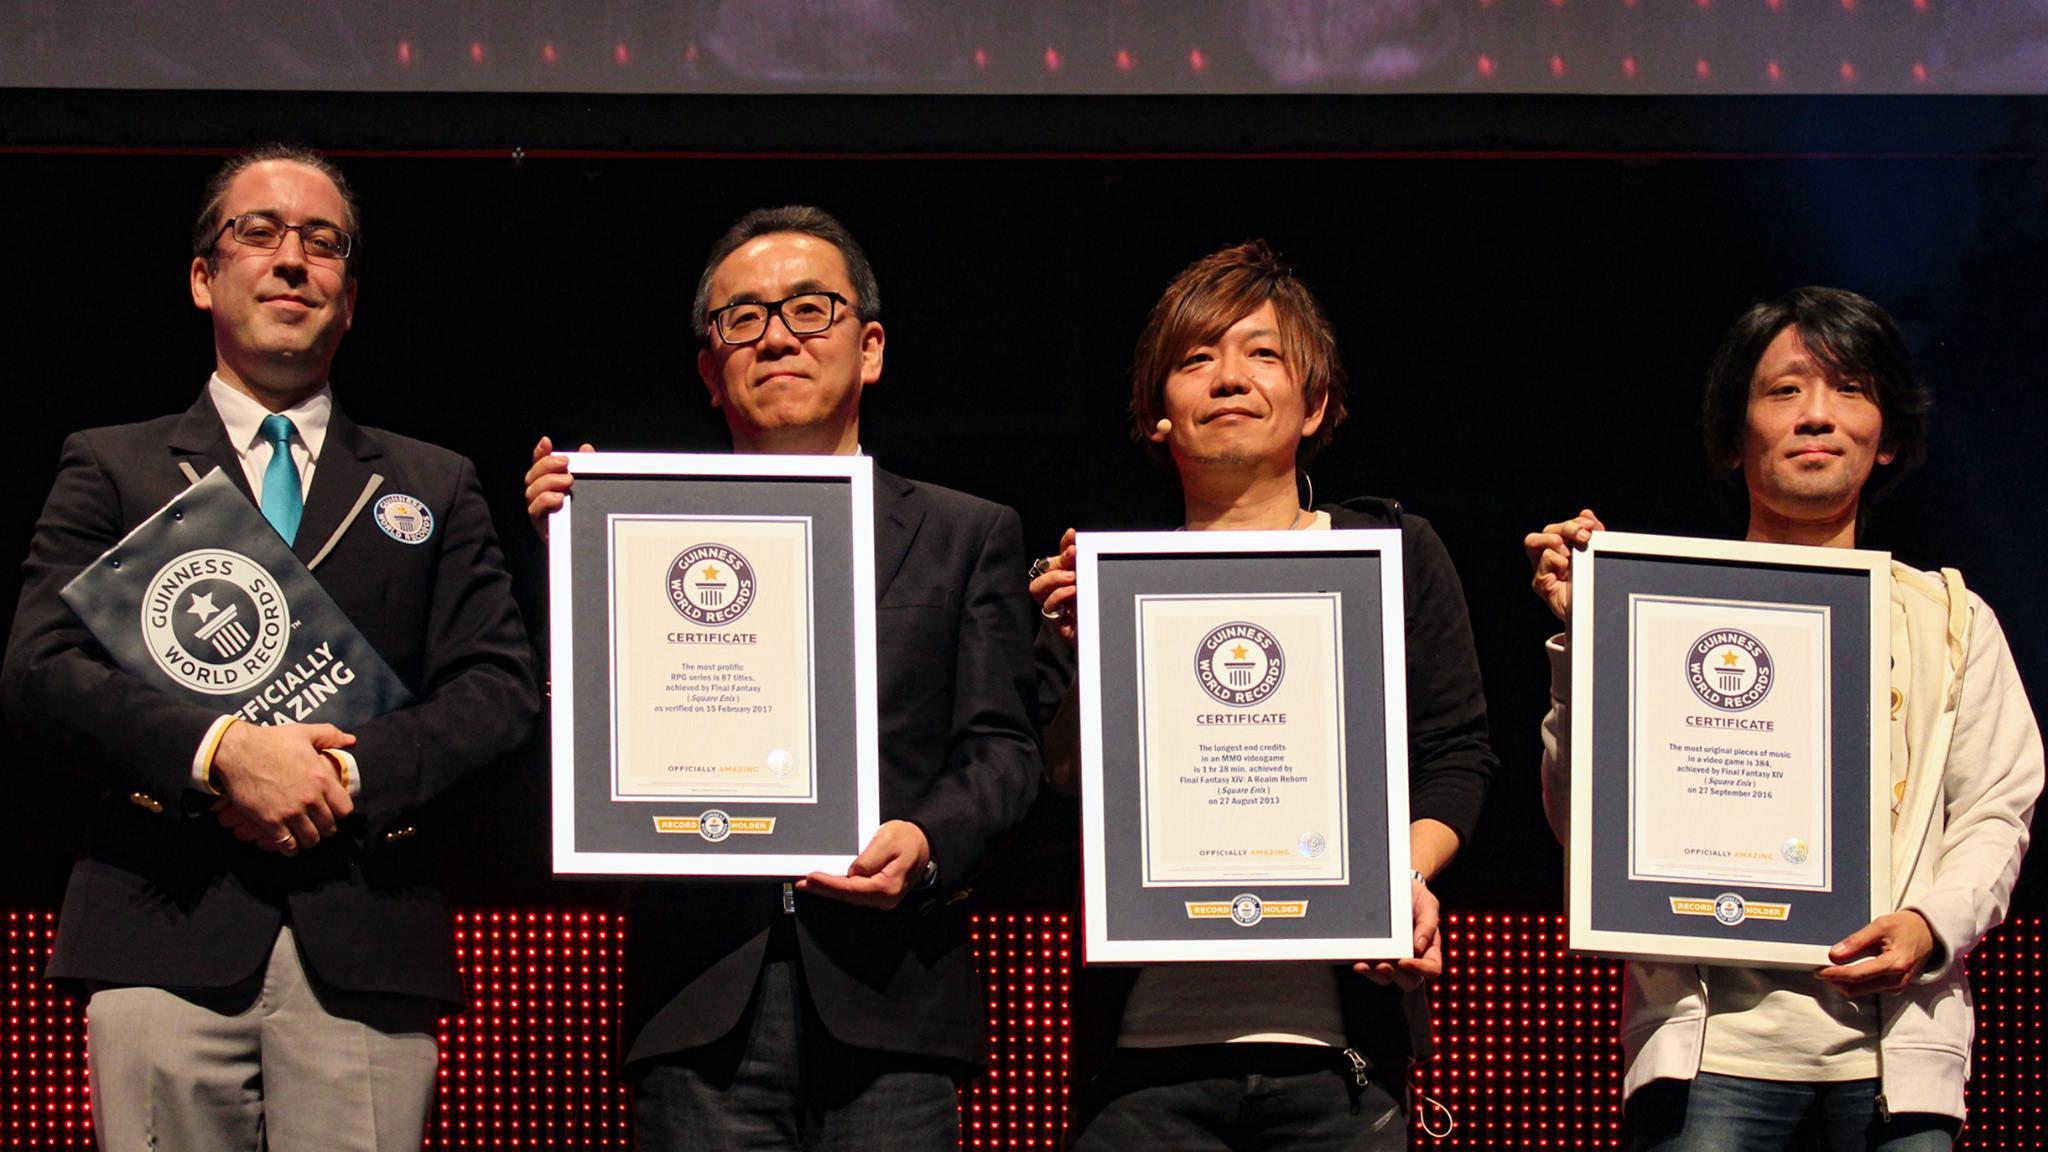 Achieving Three Guinness World Records | Final Fantasy XIV